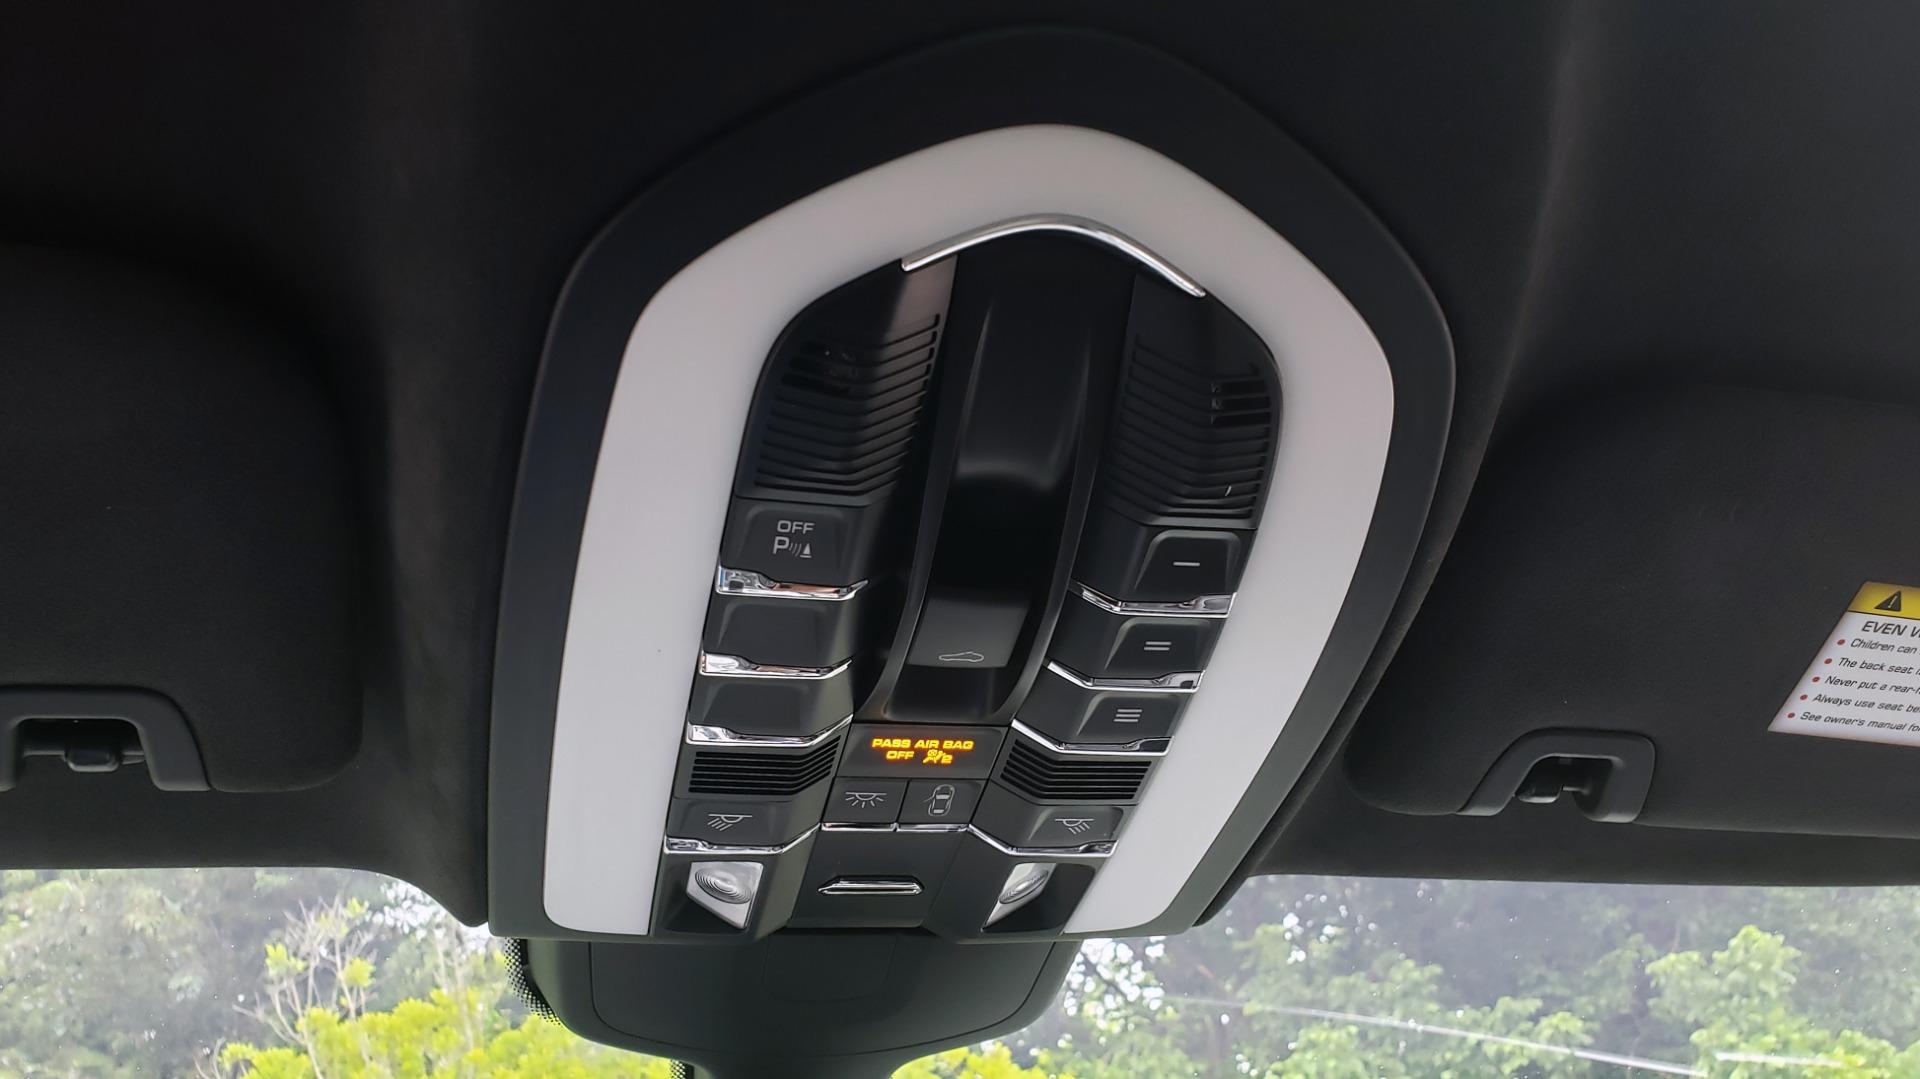 Used 2013 Porsche PANAMERA TURBO 4.8L V8 / AWD / NAV / SUNROOF / LCA / PARK ASST / BURMESTER for sale $45,995 at Formula Imports in Charlotte NC 28227 56